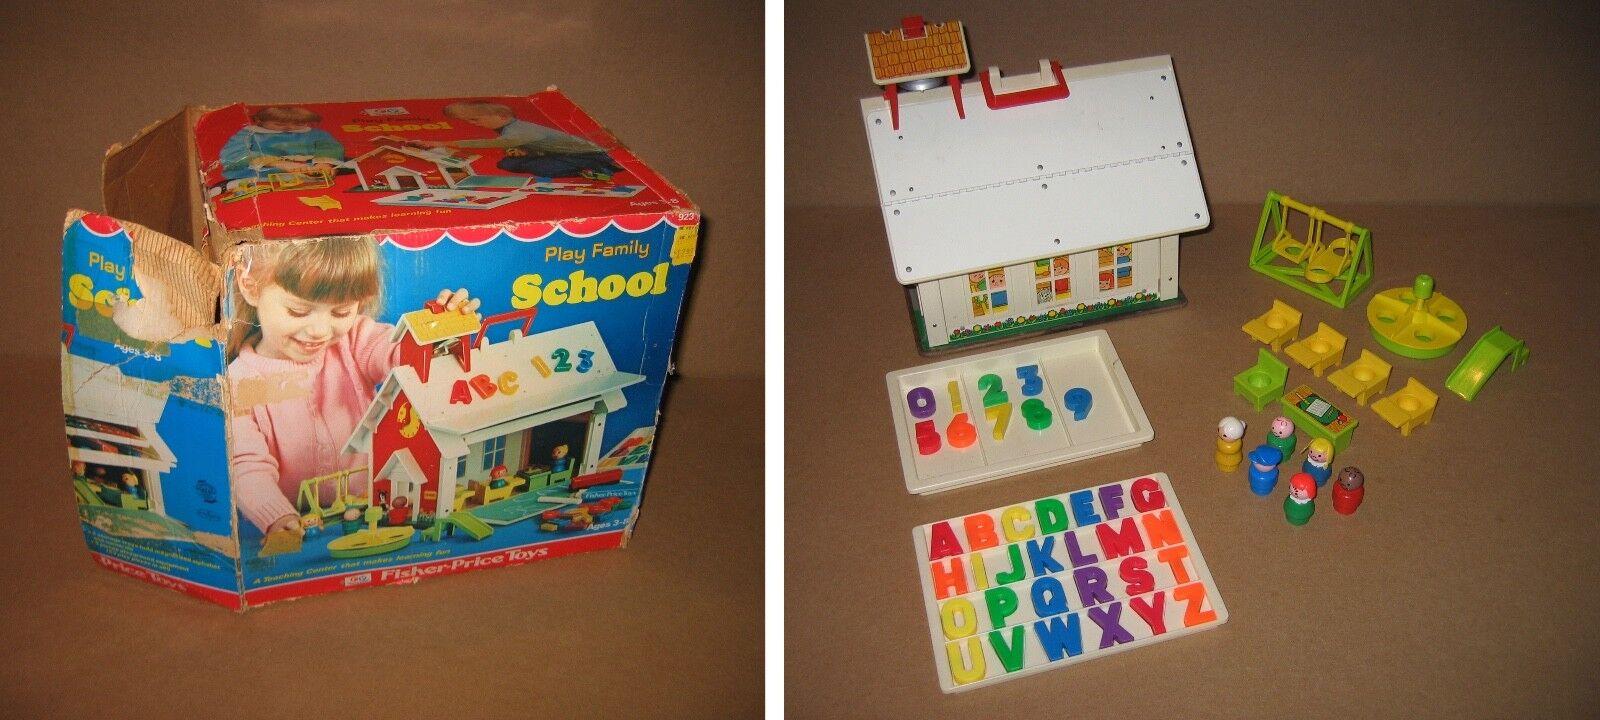 Fisher Price spela Family School w låda 95% Fullborda STORA KOND 1971